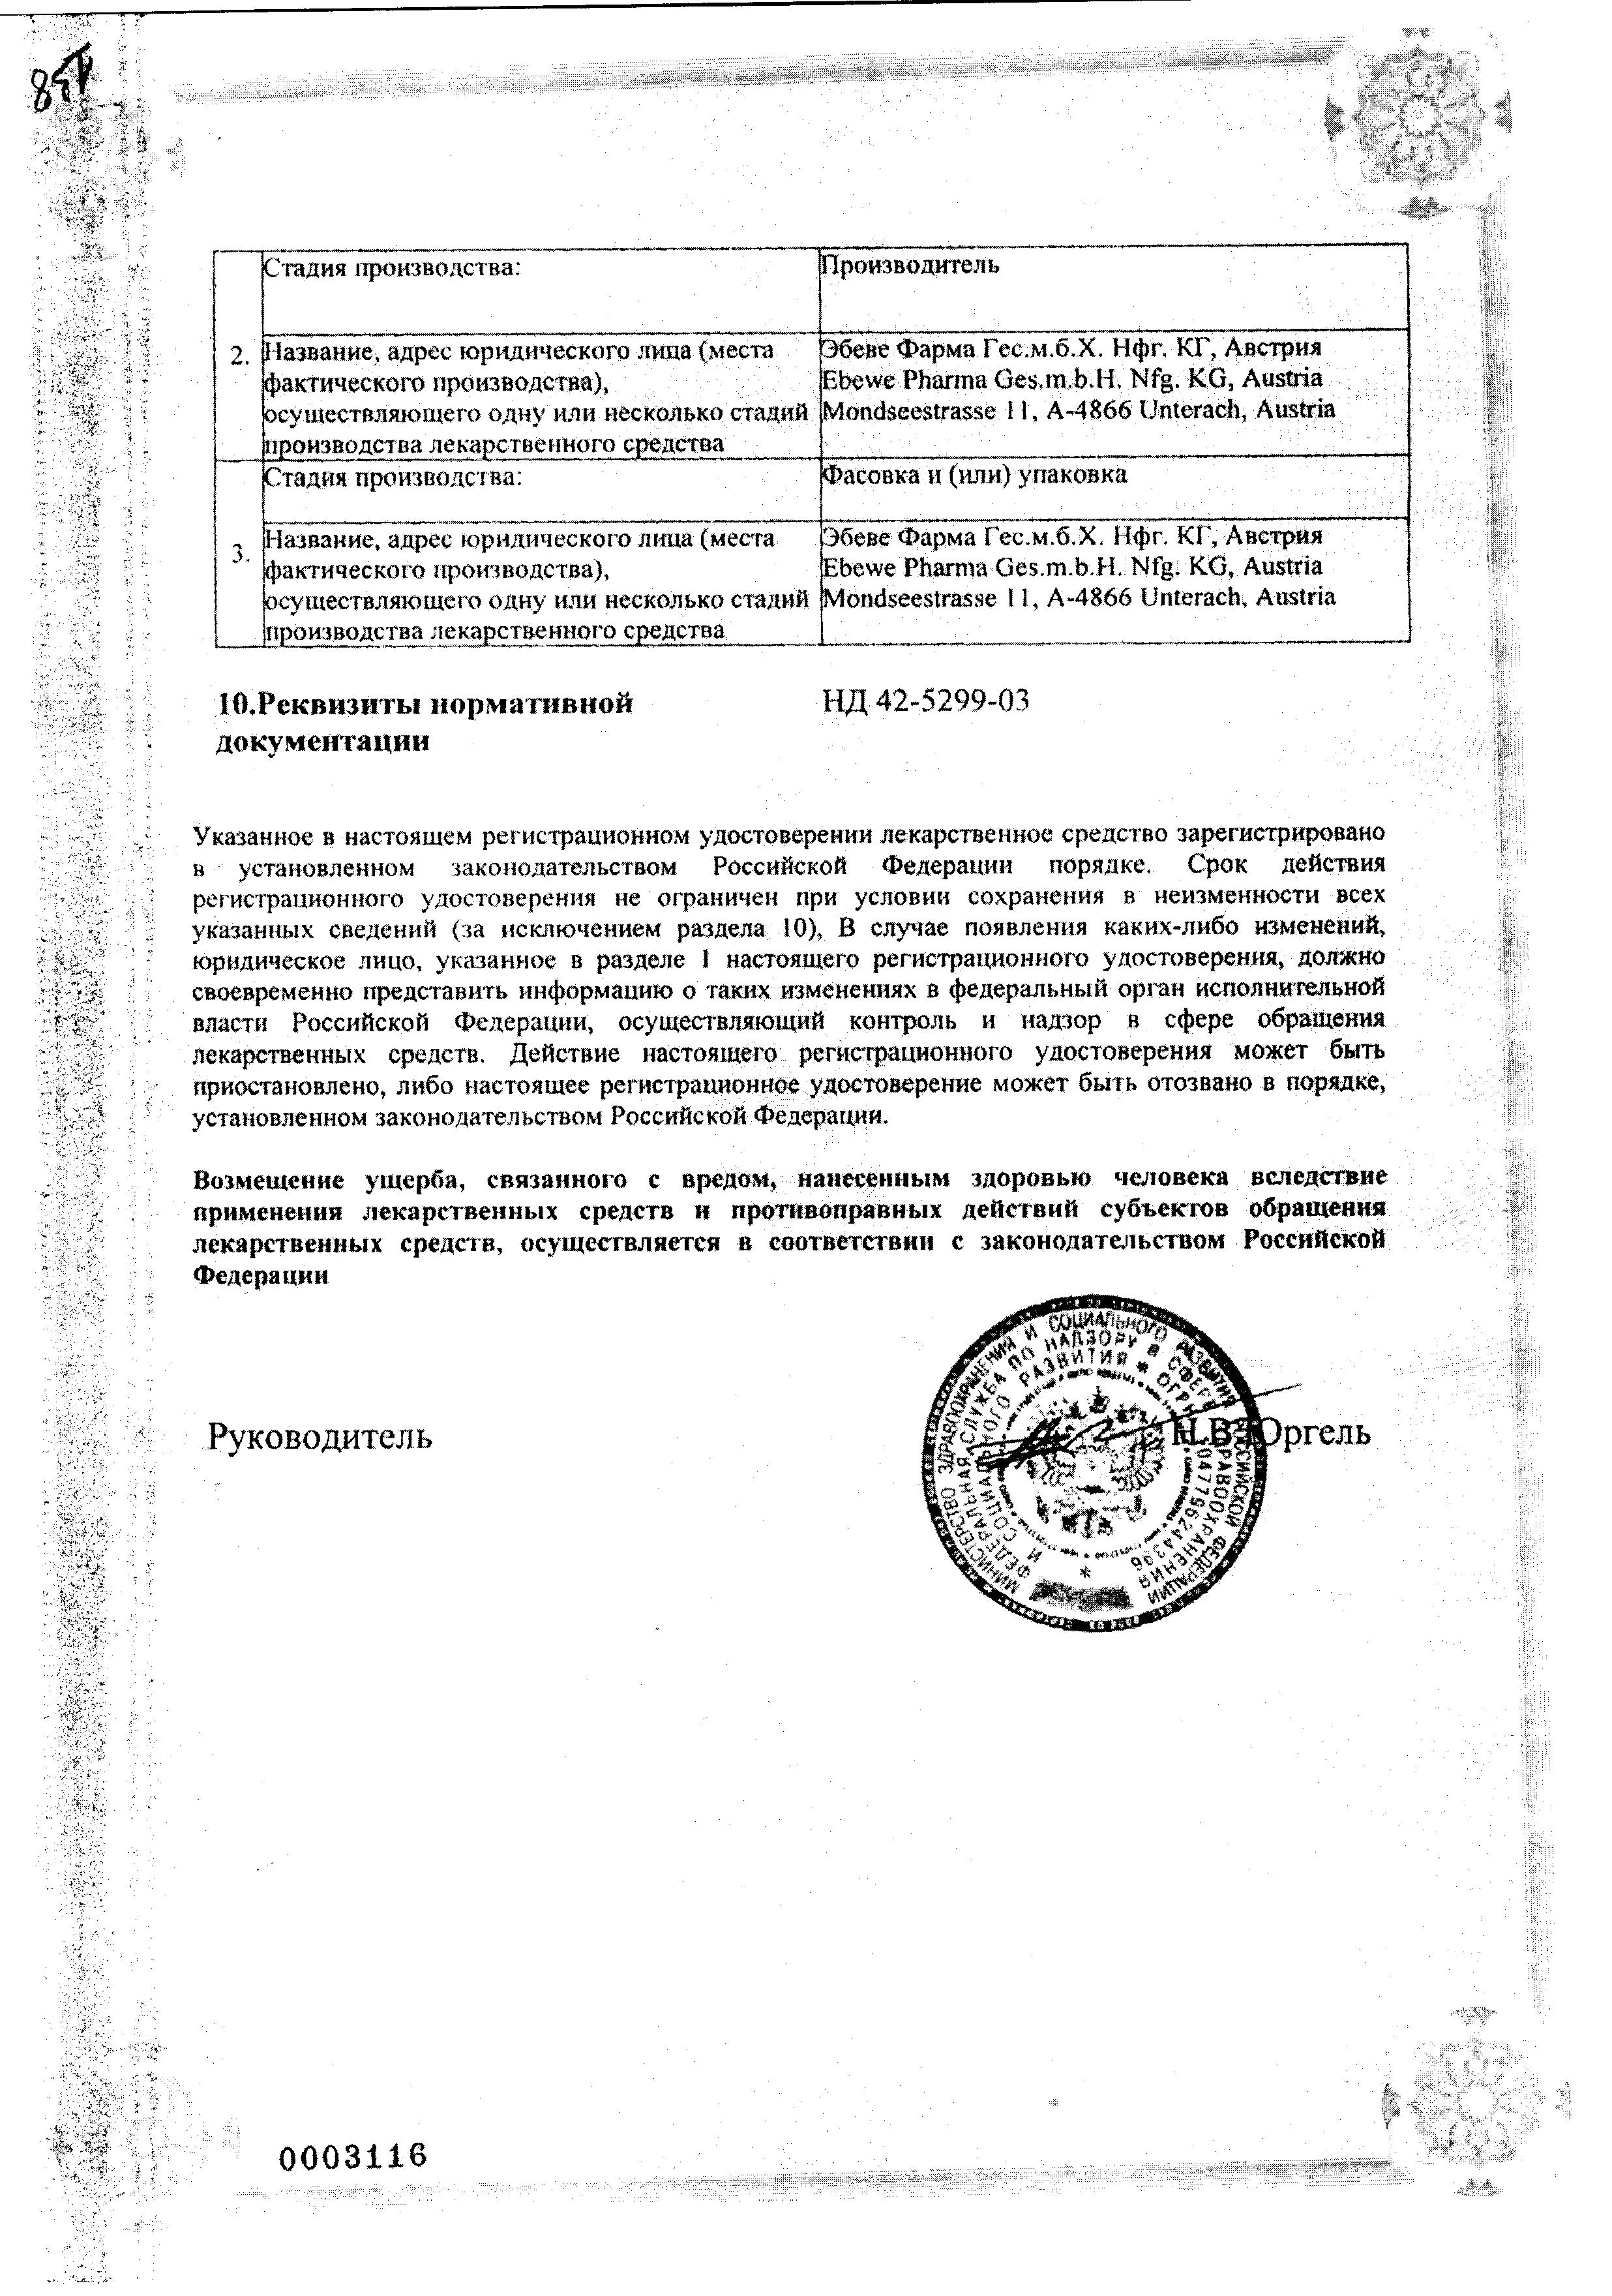 5-Фторурацил-Эбеве